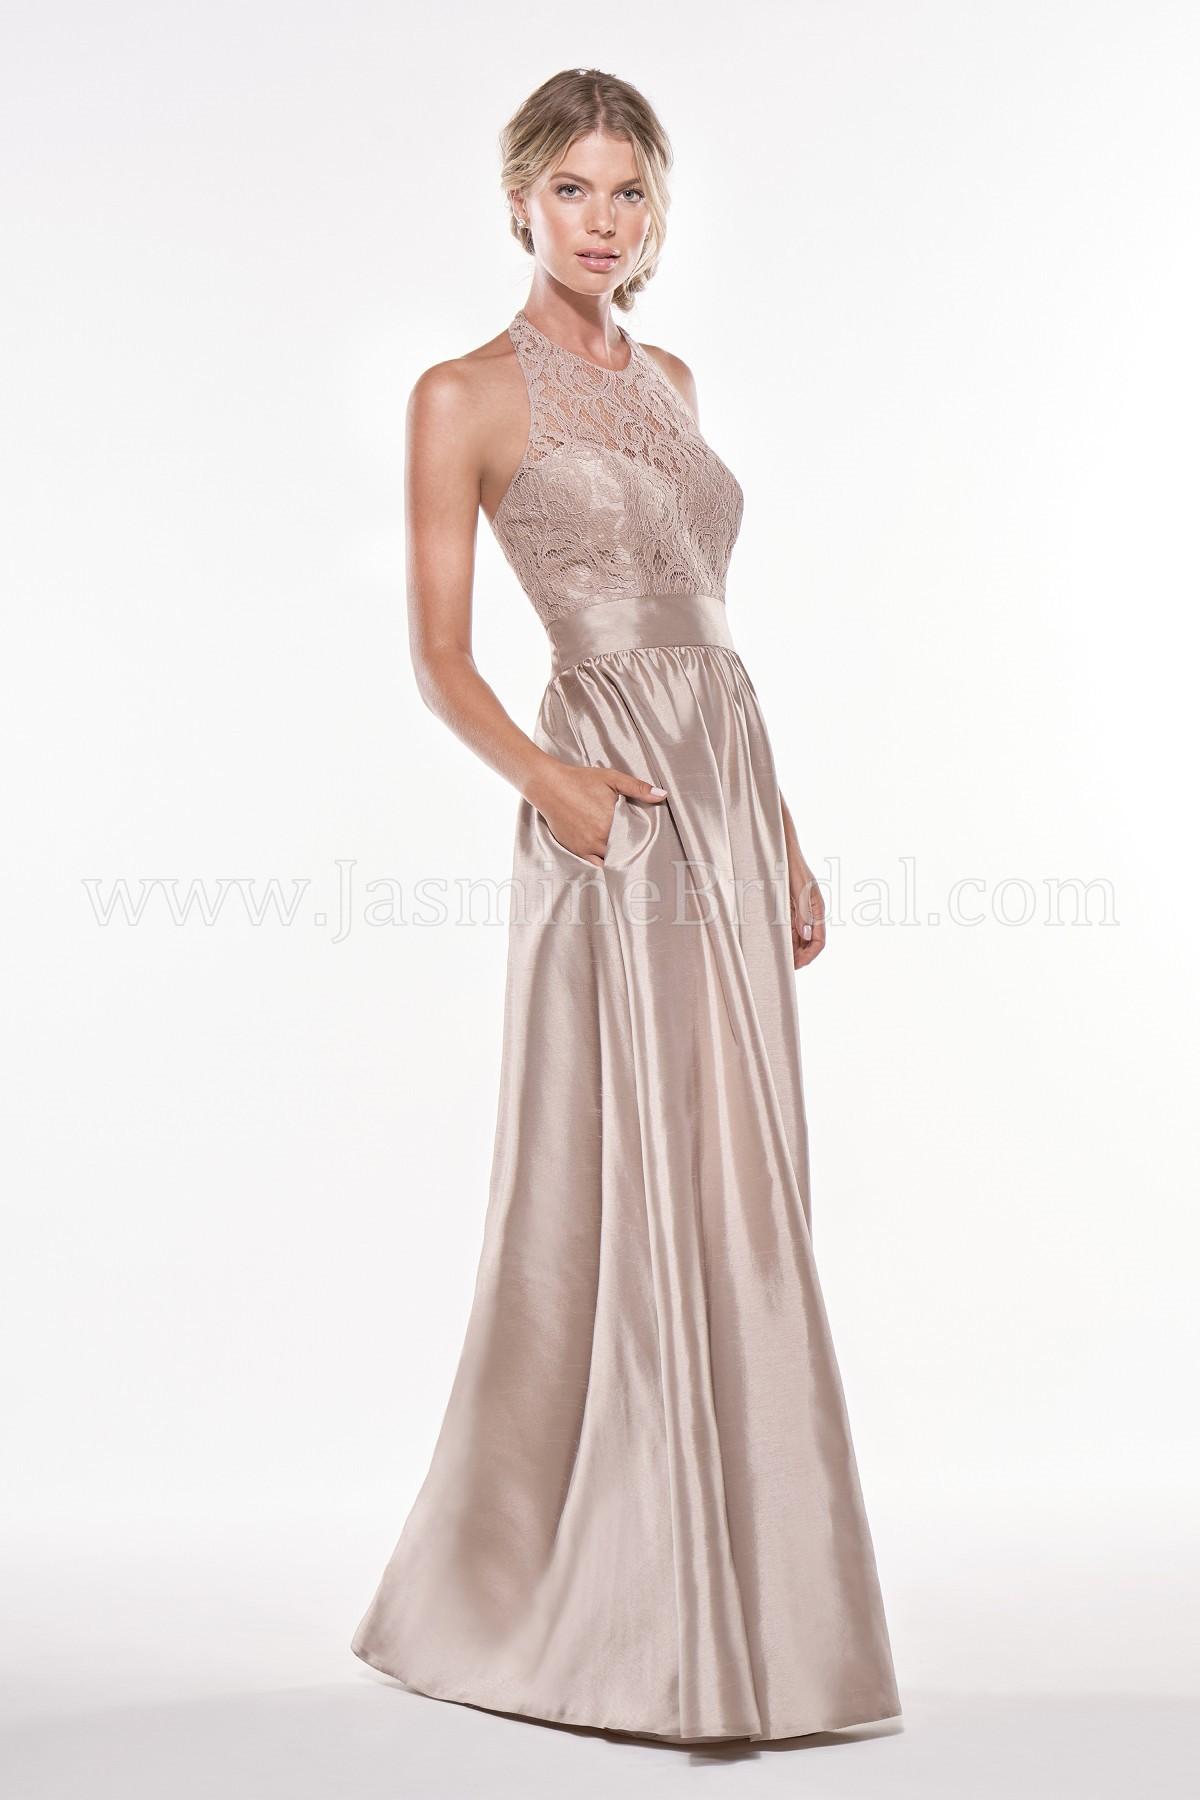 P196010 Long Jewel Neckline Lace & Satin Back Dupioni Bridesmaid Dress